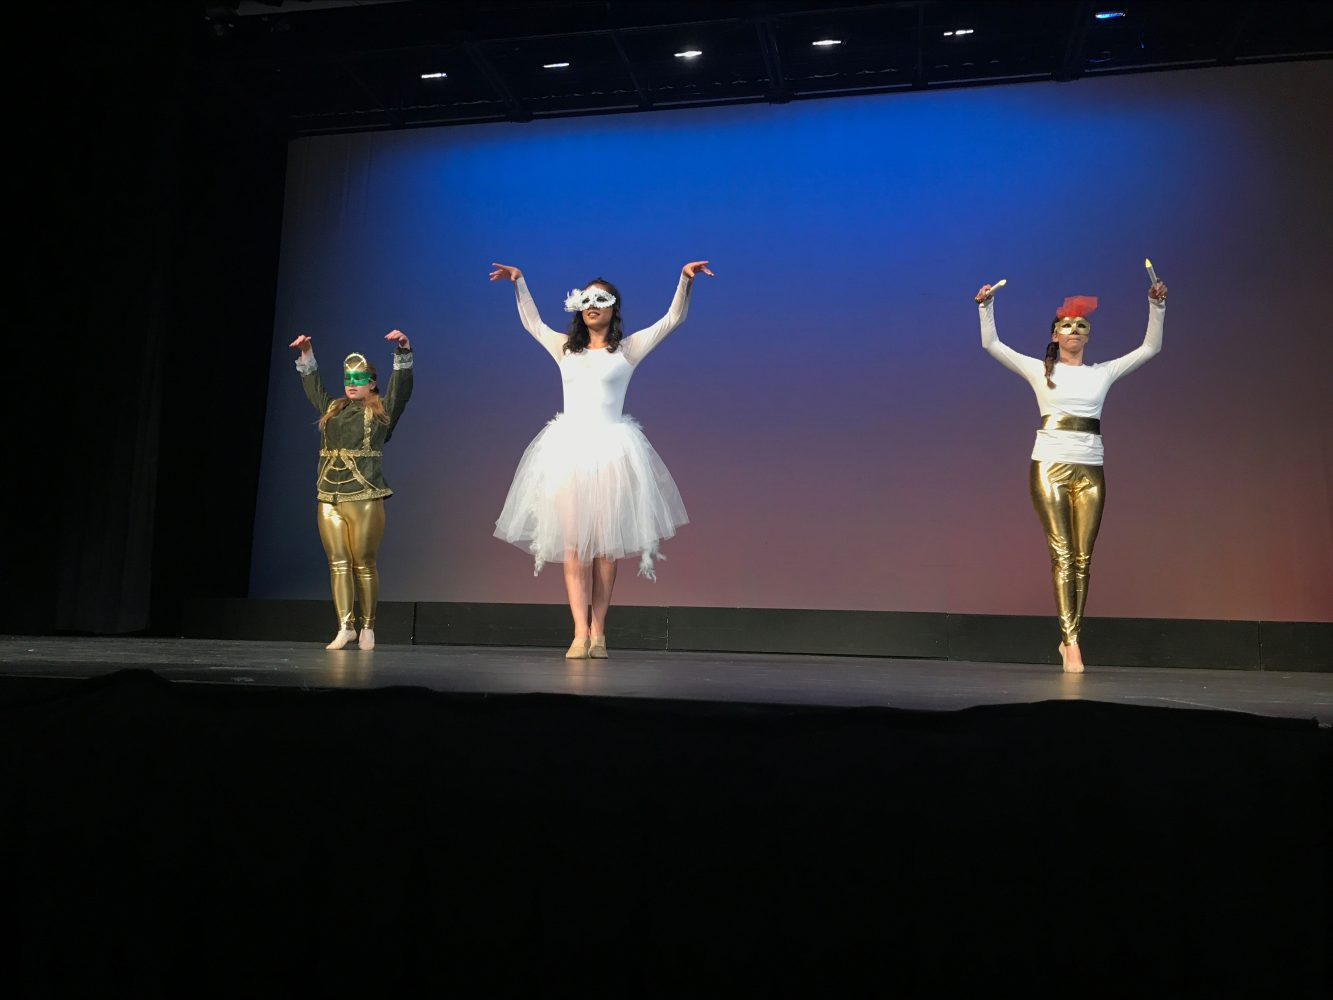 Disney dance show dazzles